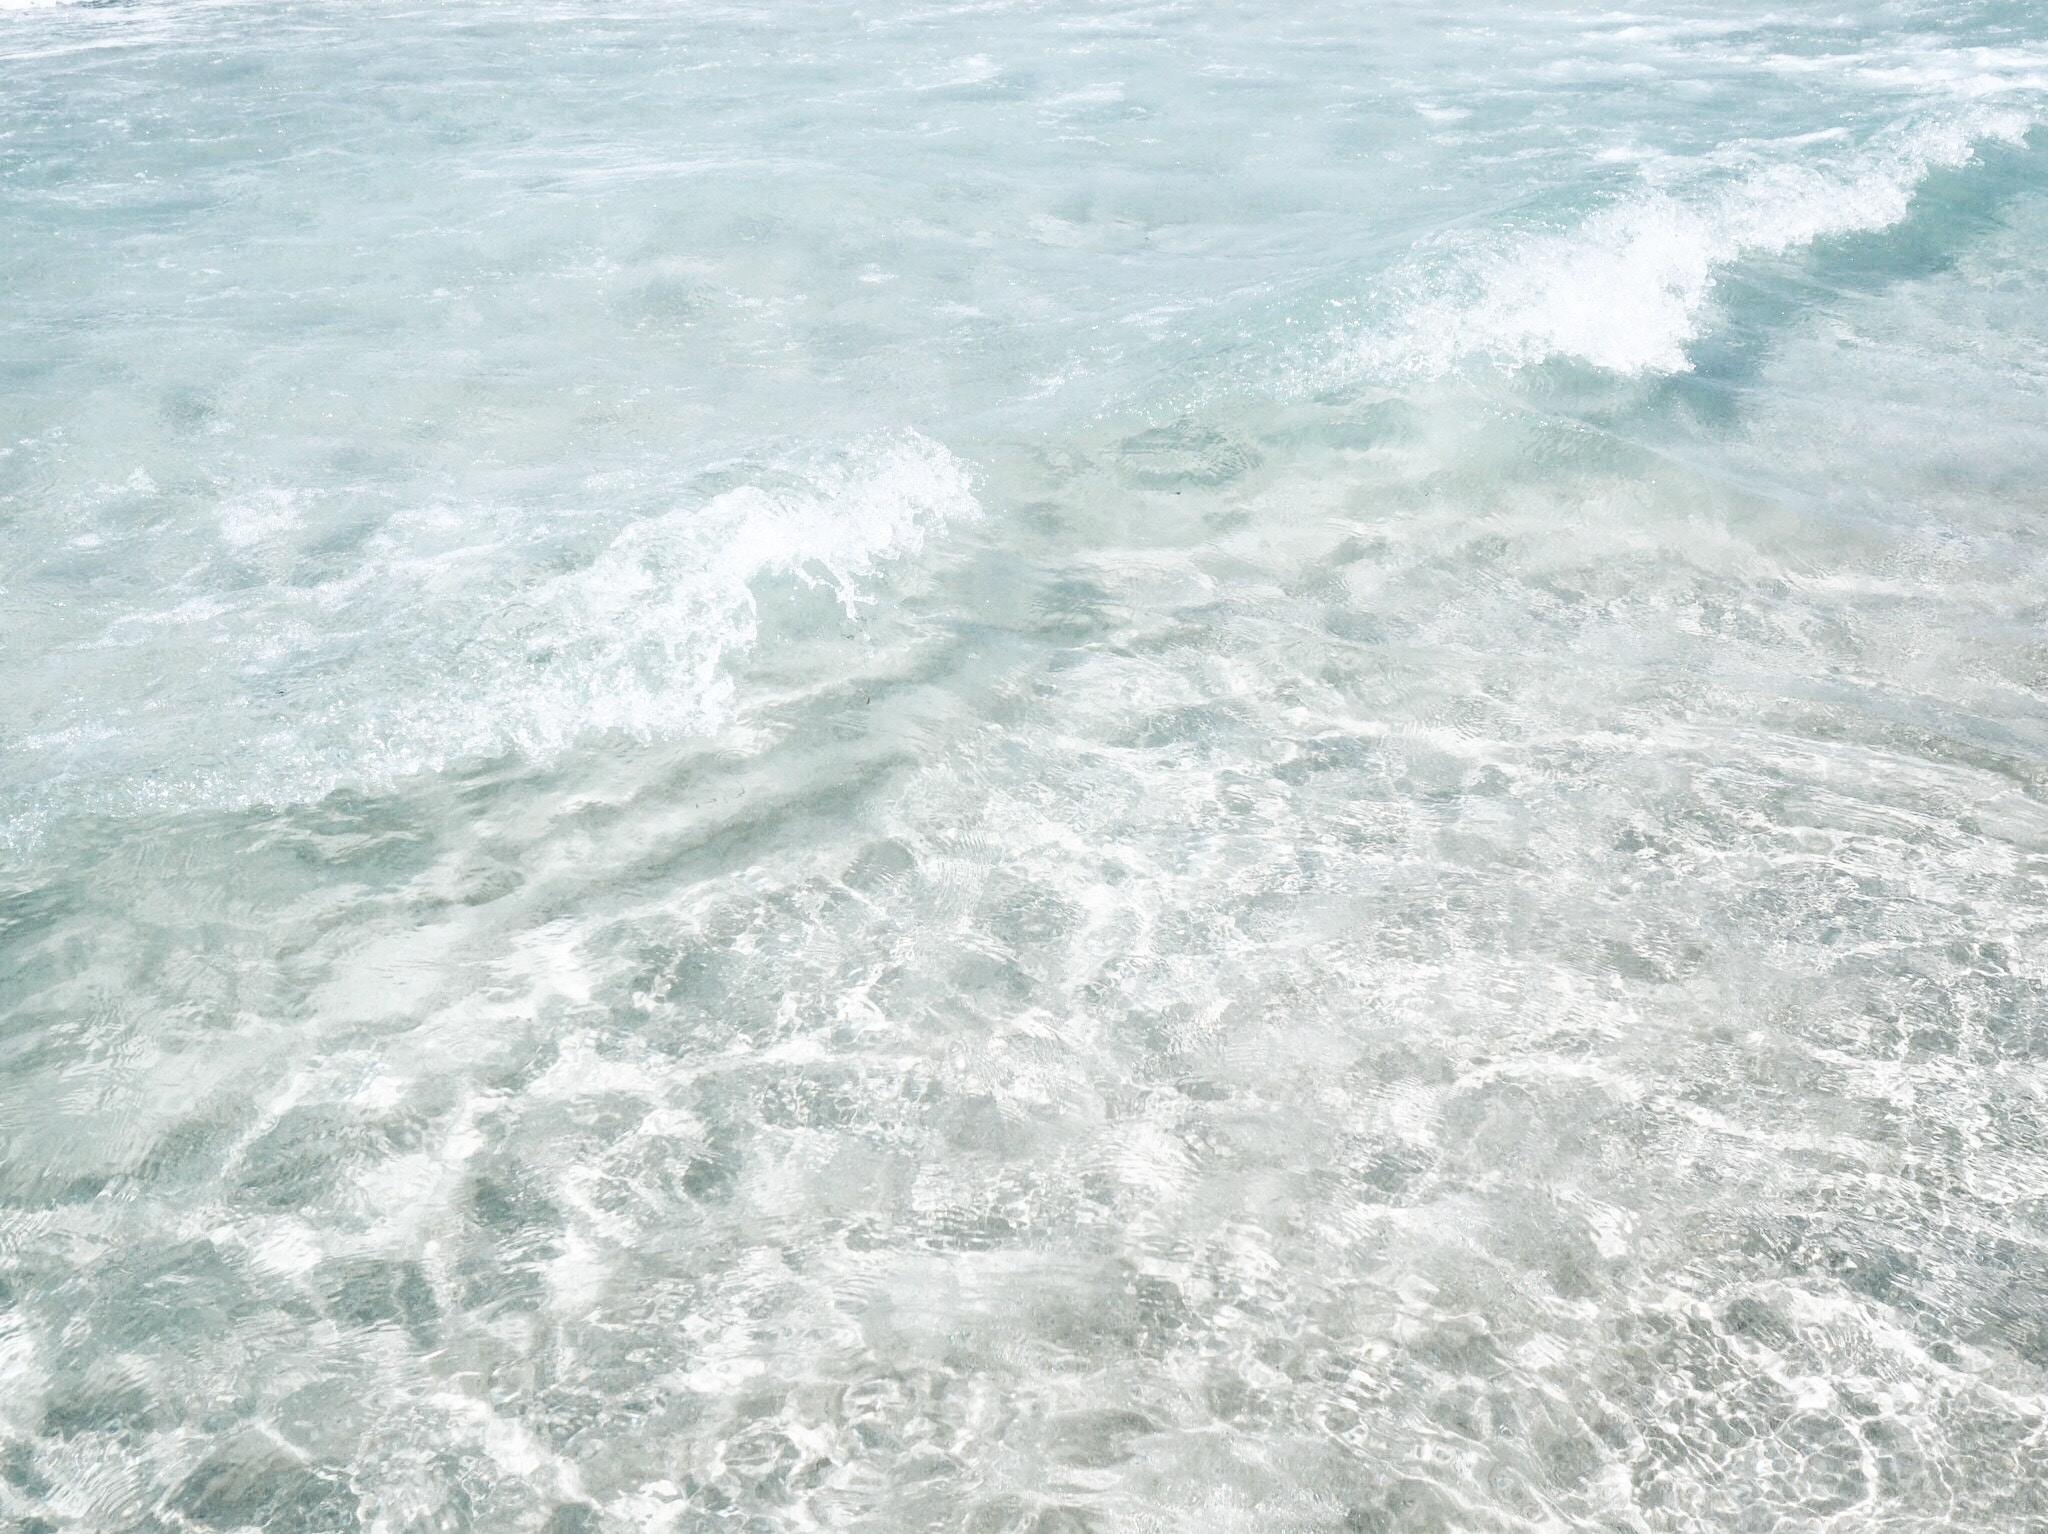 rippling body of water